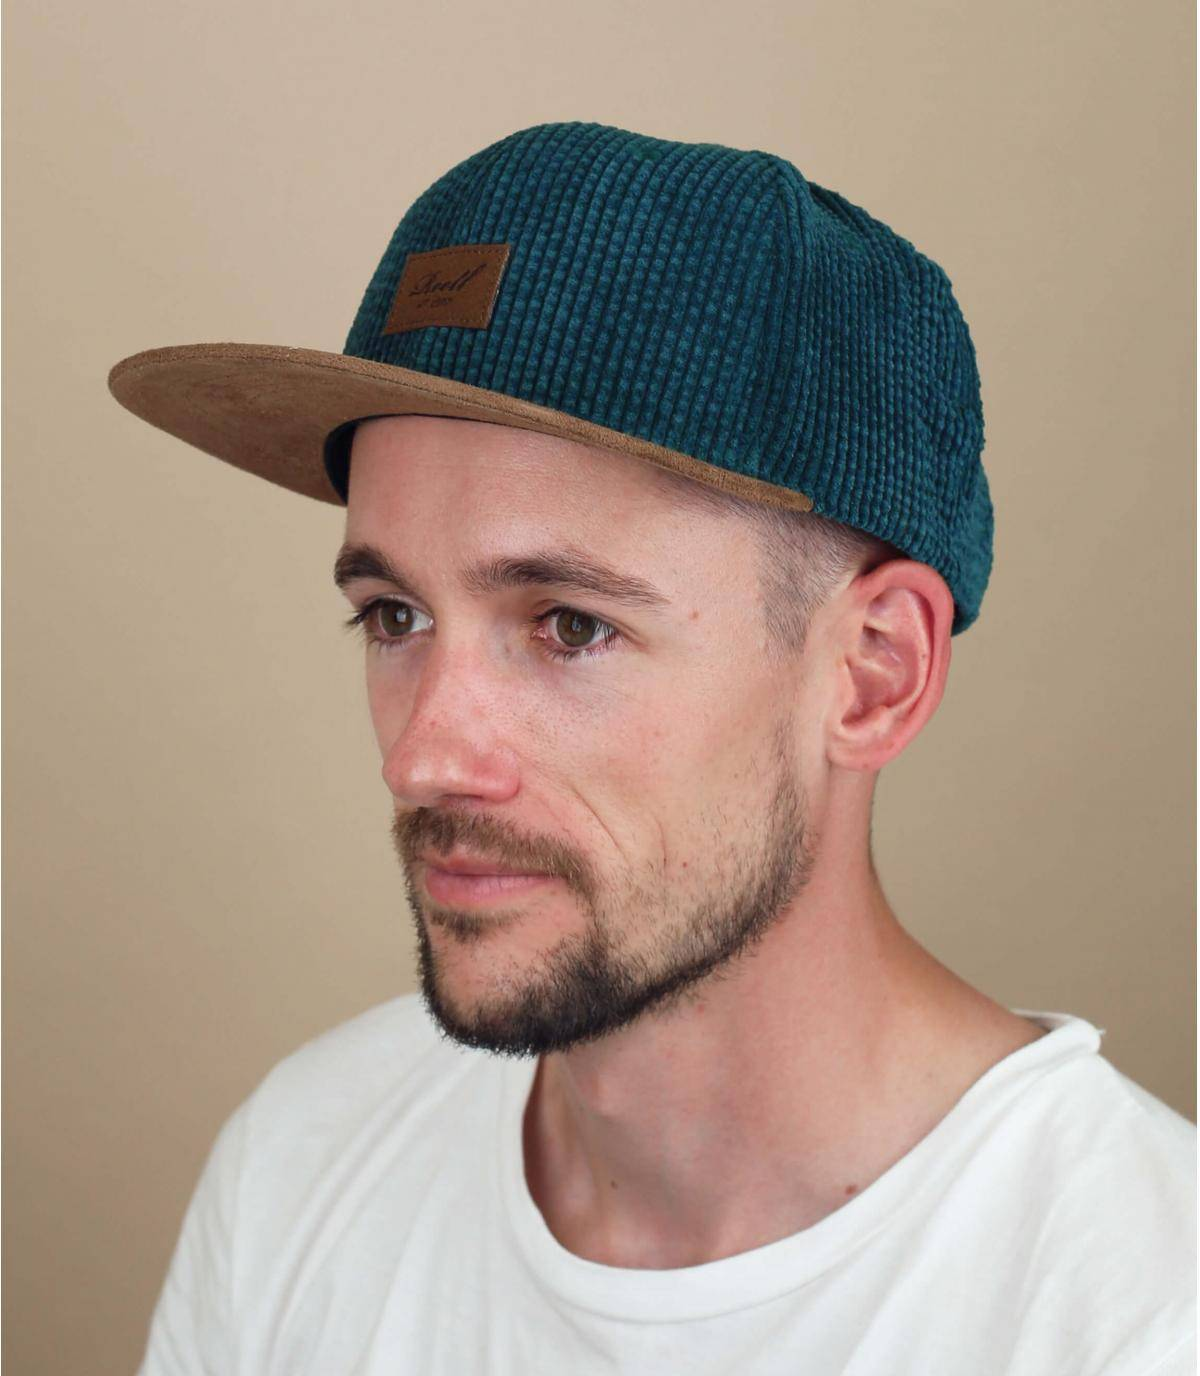 cappellino Reell velluto verde